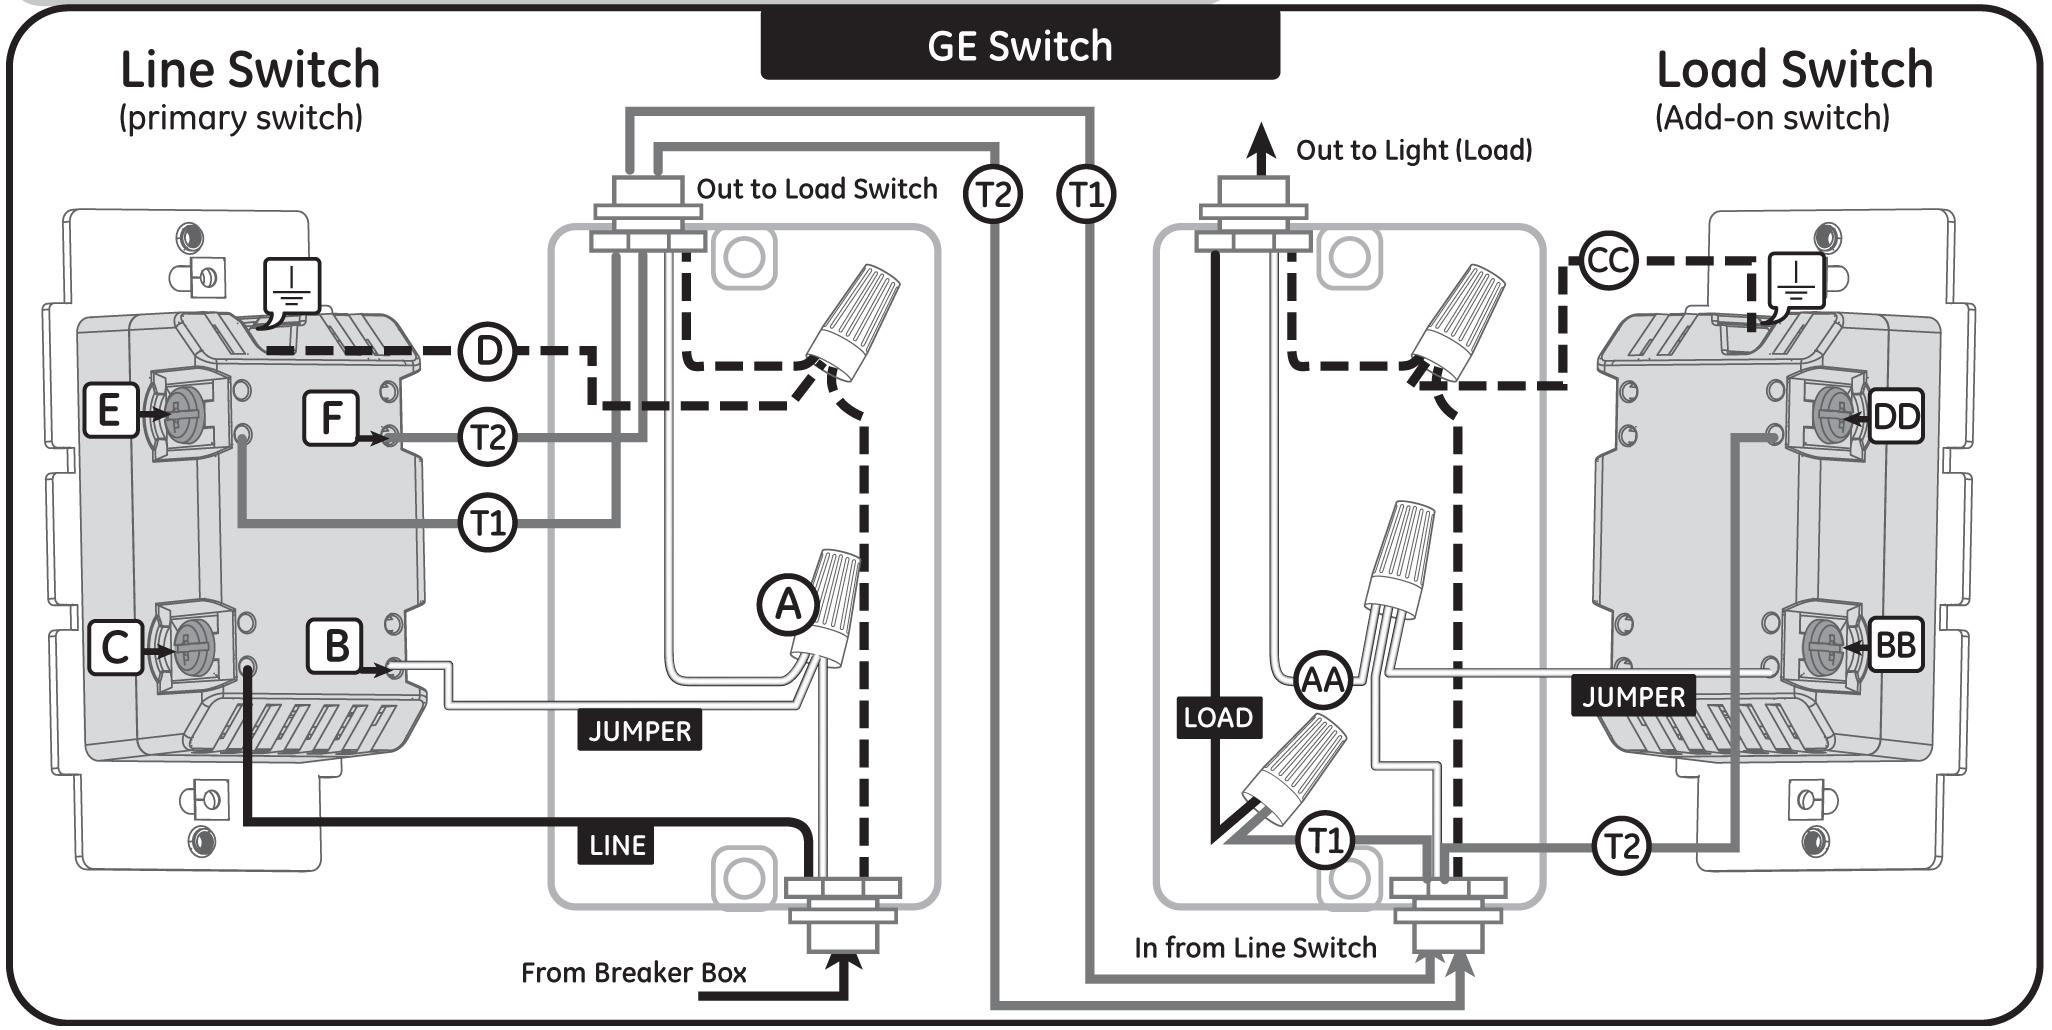 3 Way Dimmer Wiring Single Pole Wiring Diagram For A As | Best - 3 Way Dimmer Switches Wiring Diagram